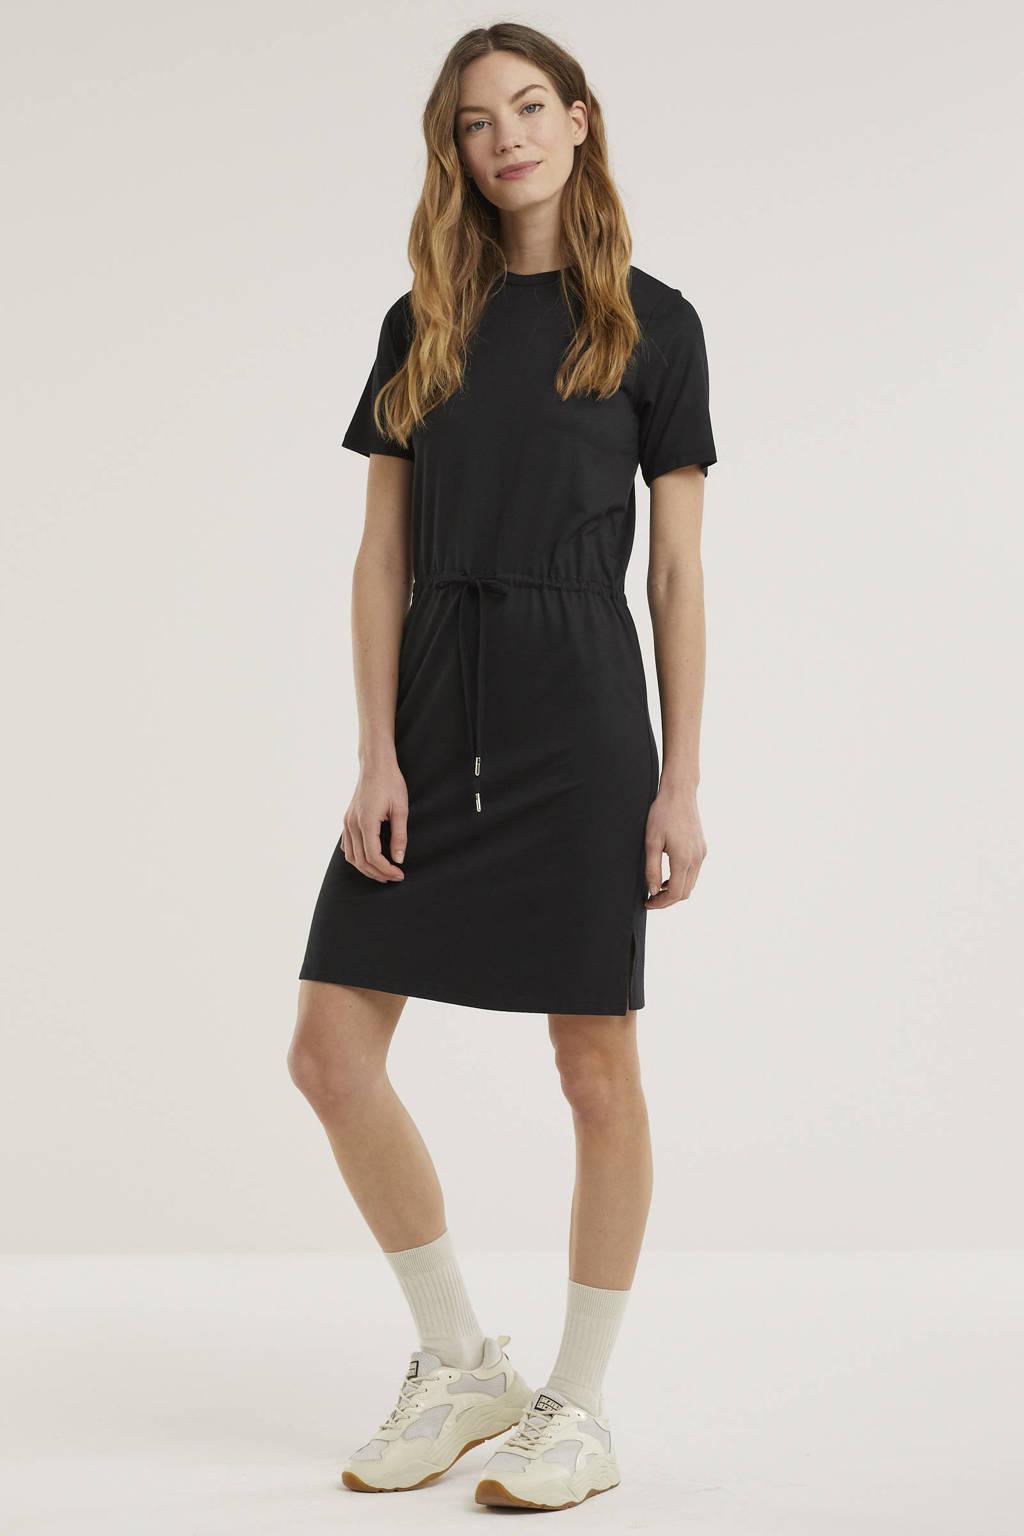 Superdry jurk zwart, Zwart